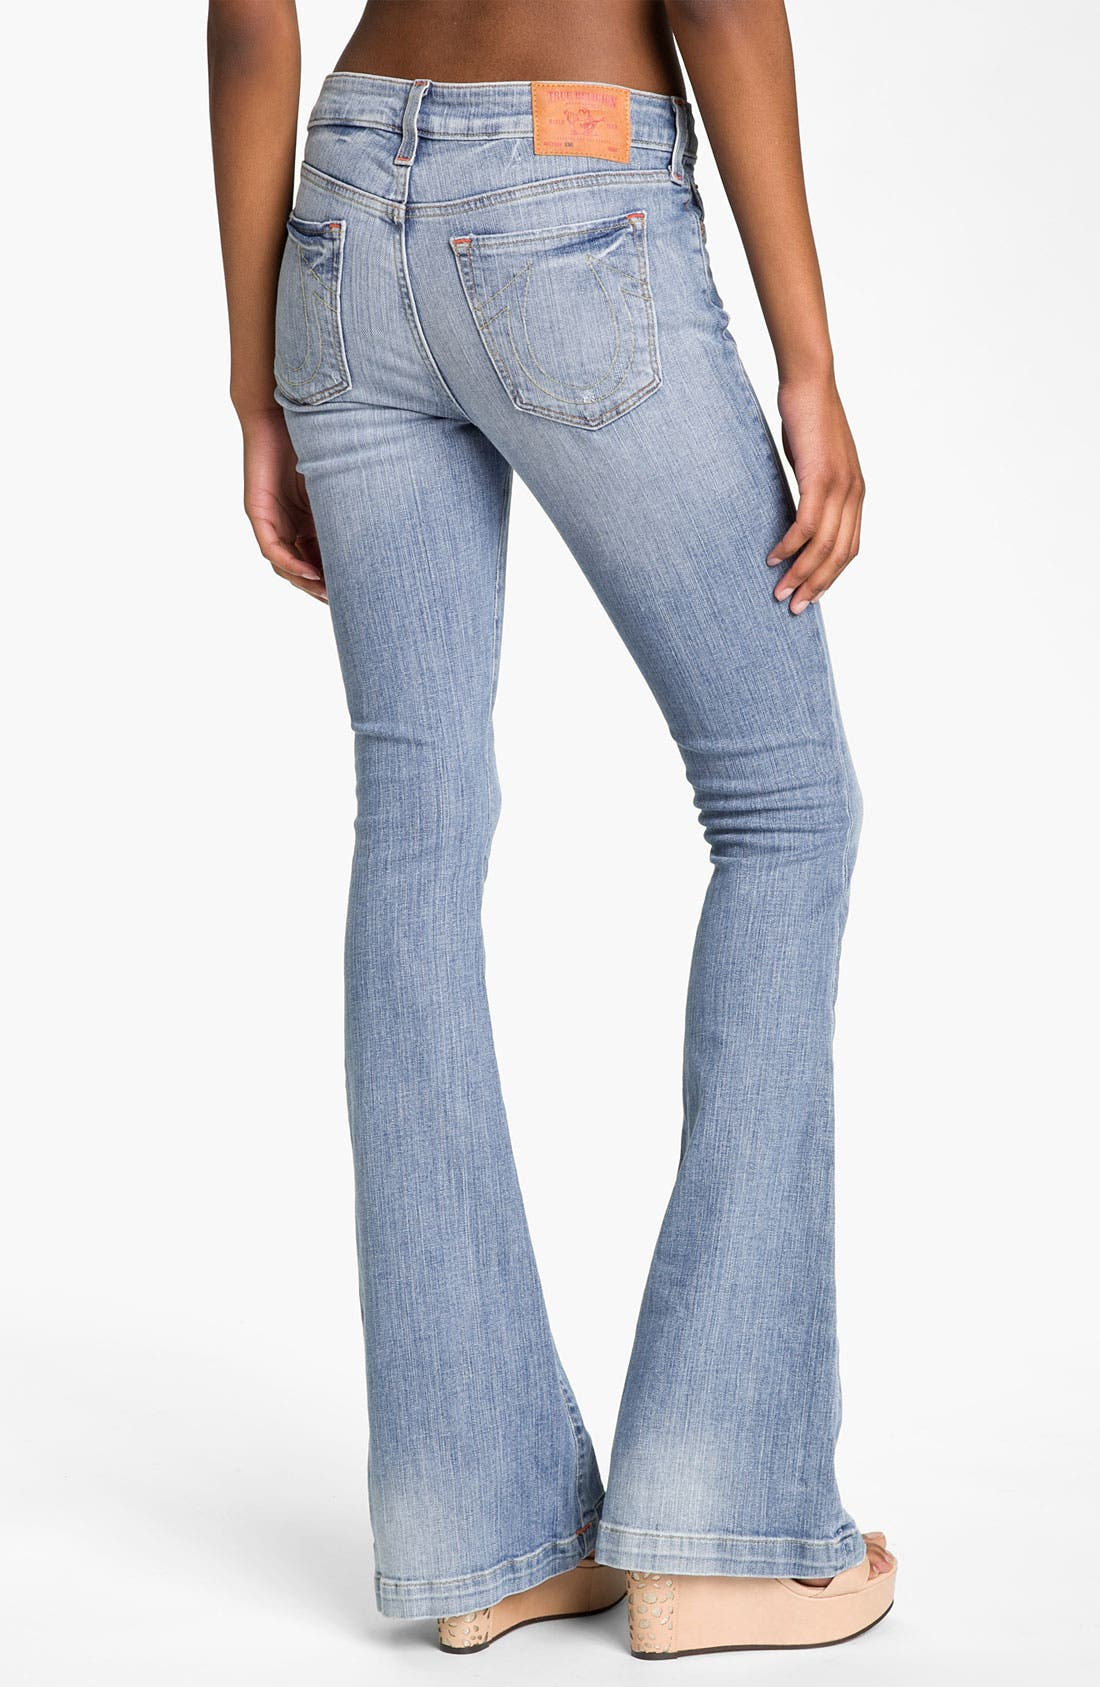 Alternate Image 2  - True Religion Brand Jeans 'Emi'' Distressed Flare Leg Jeans (Medium Drifter)